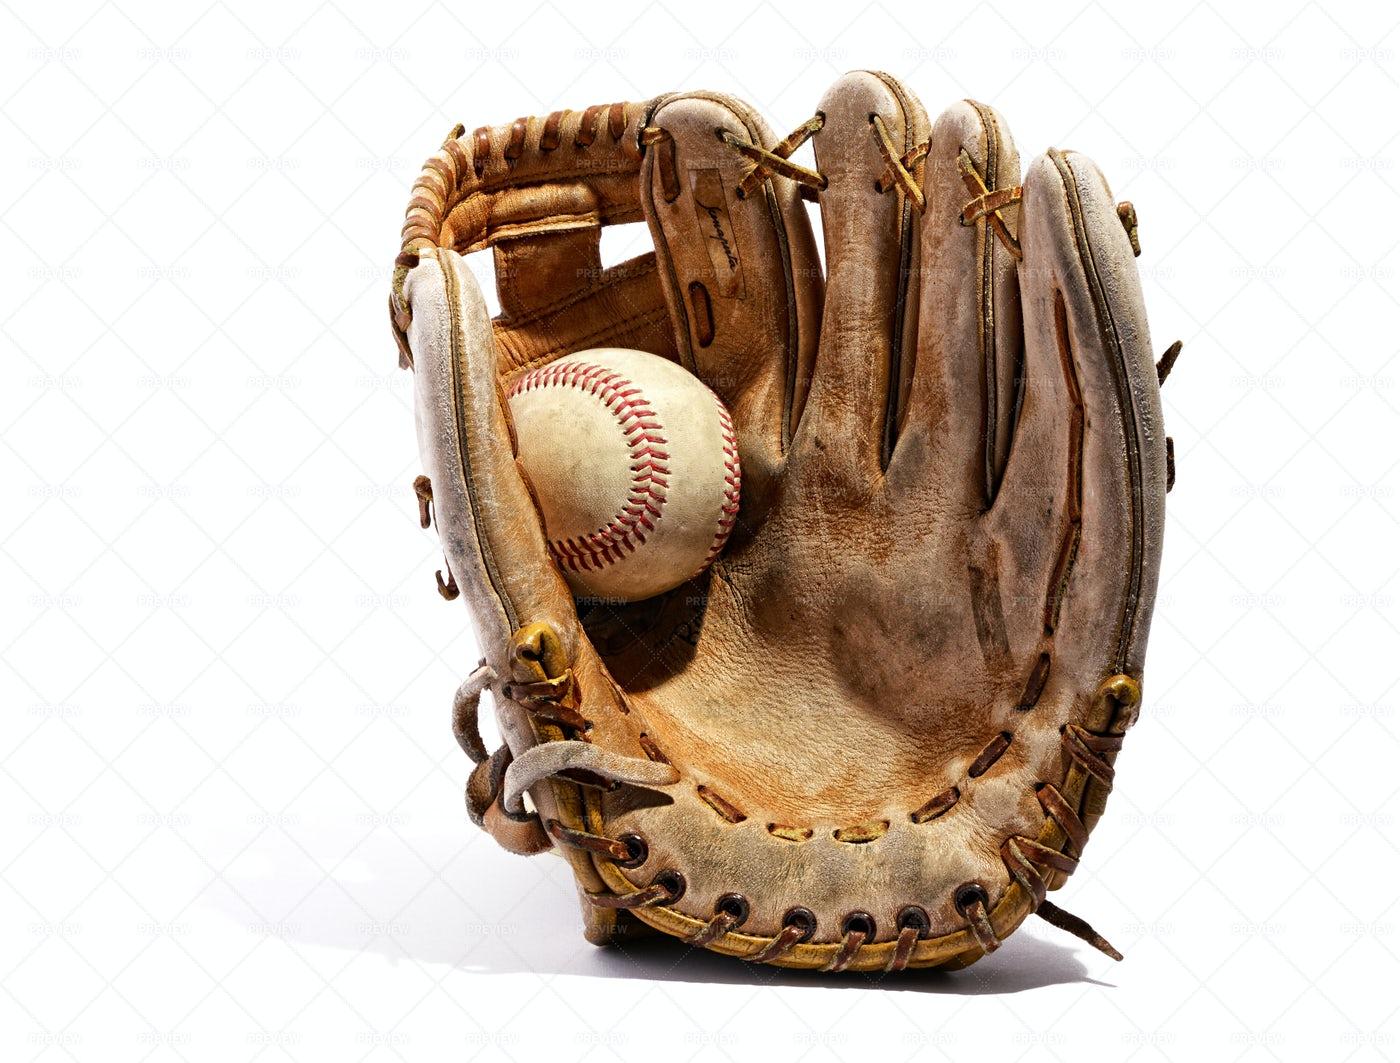 Vintage Leather Baseball Glove: Stock Photos